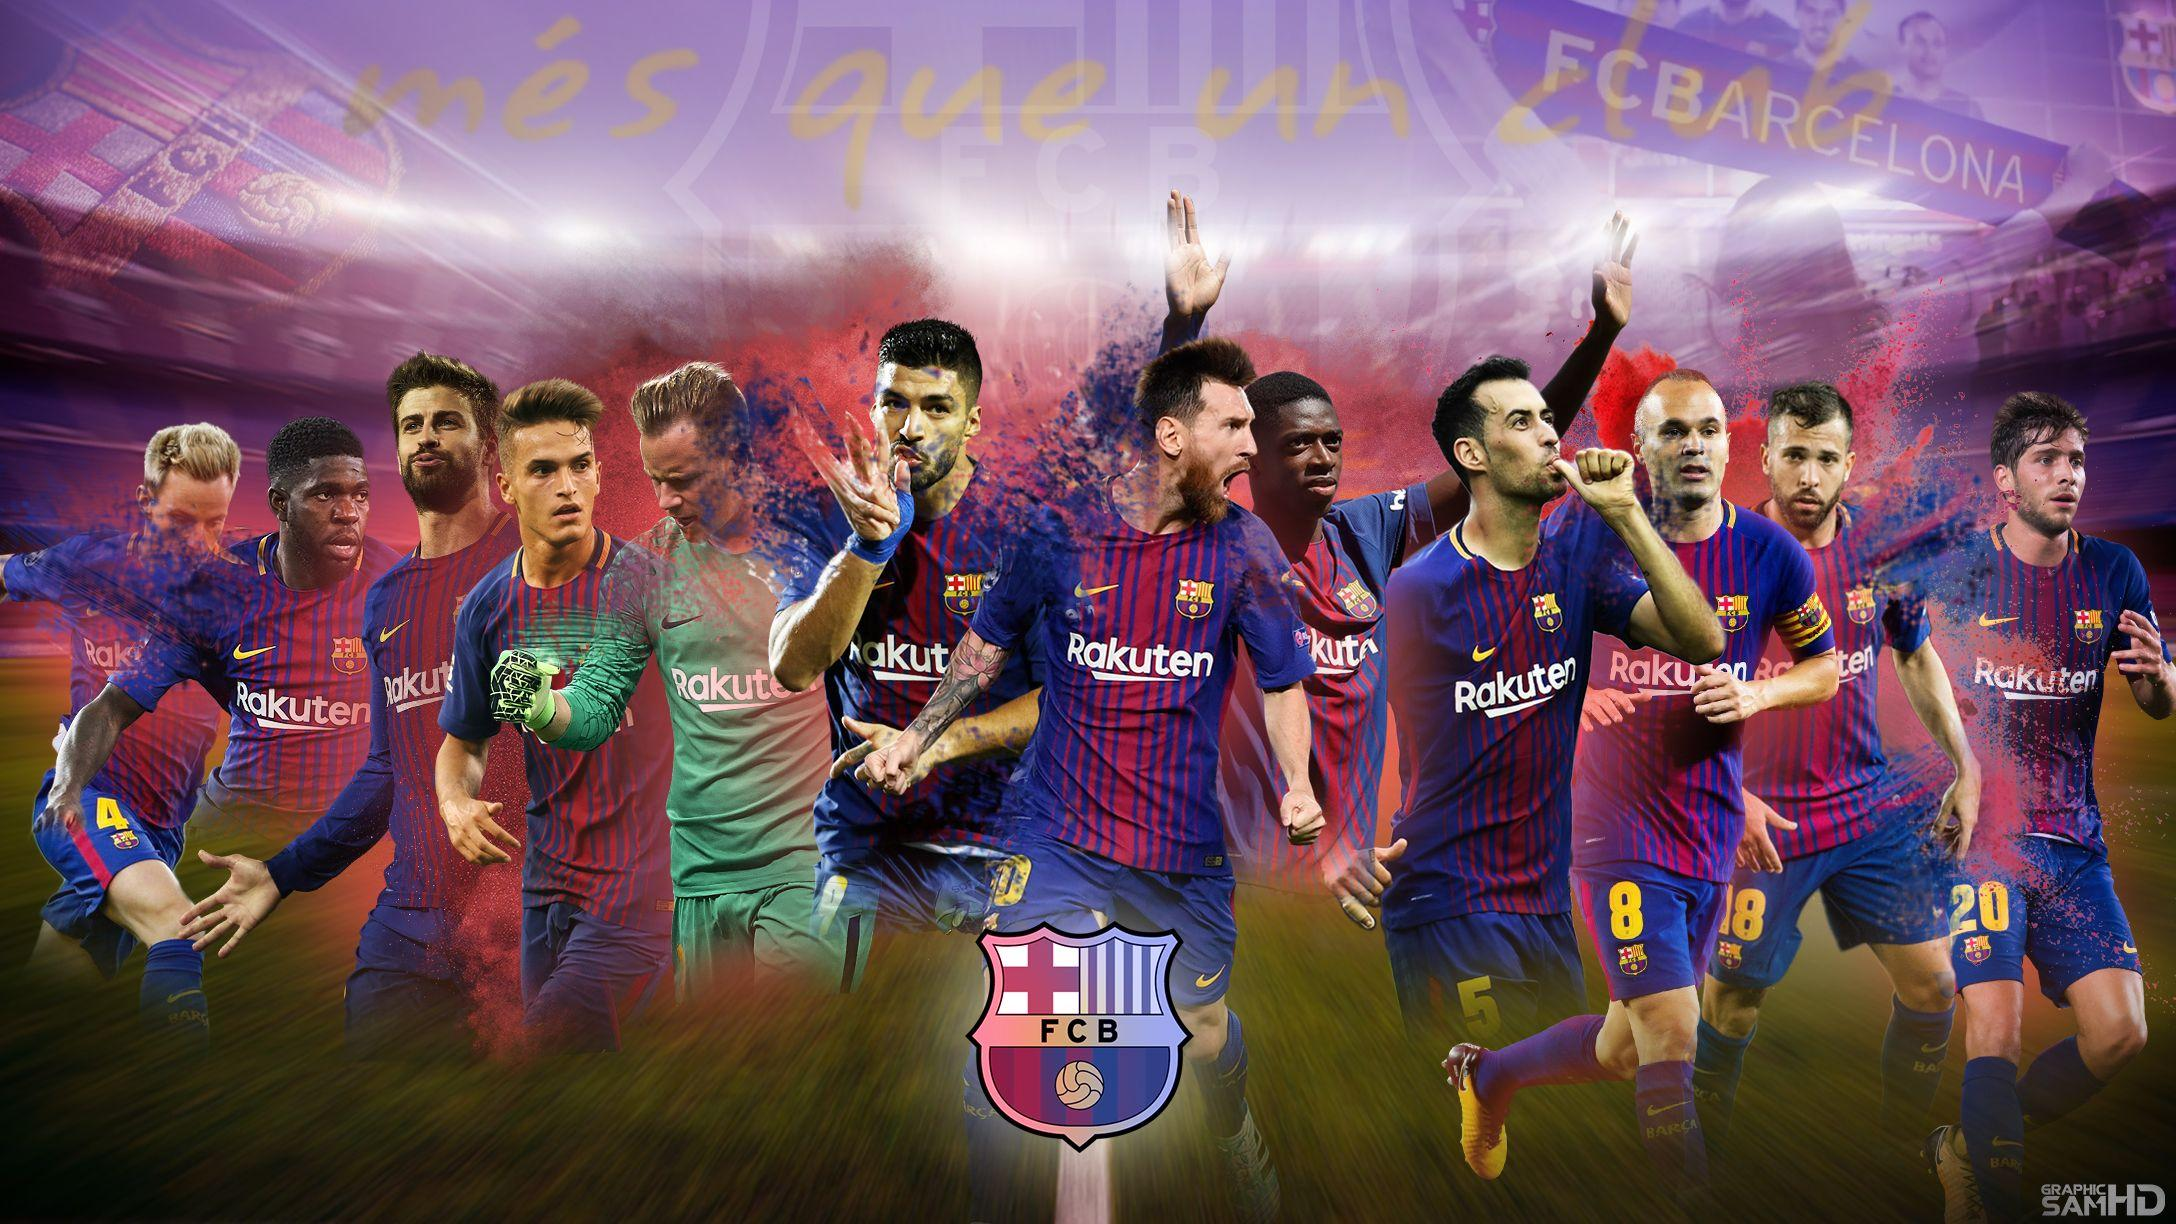 FC Barcelona 2018 Wallpapers - Wallpaper Cave